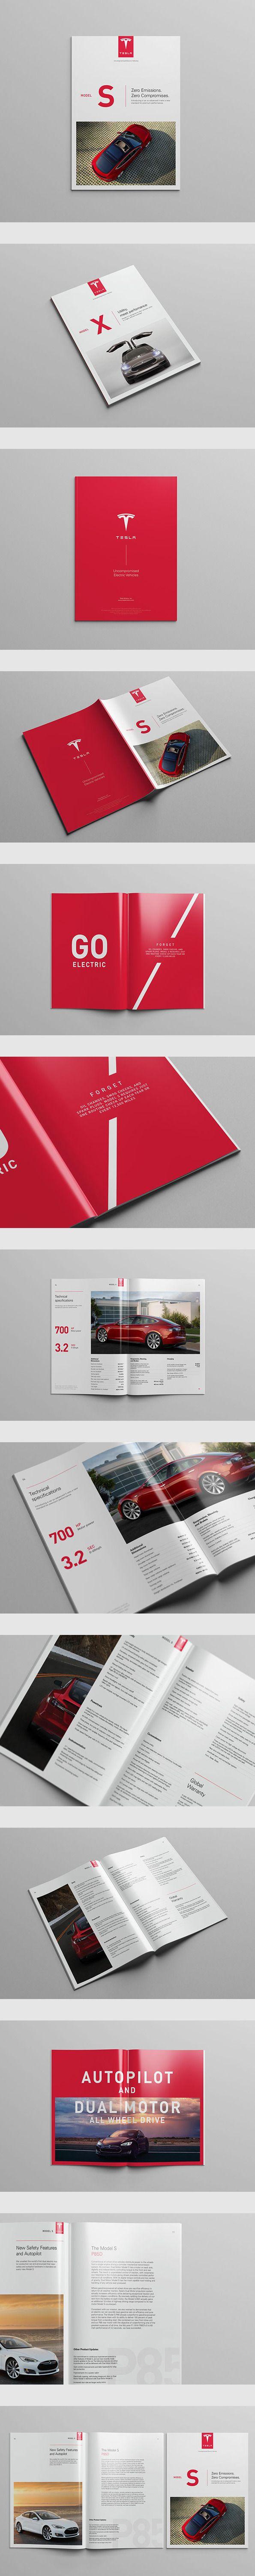 Tesla Model S Catalog by Serge Mistyukevych